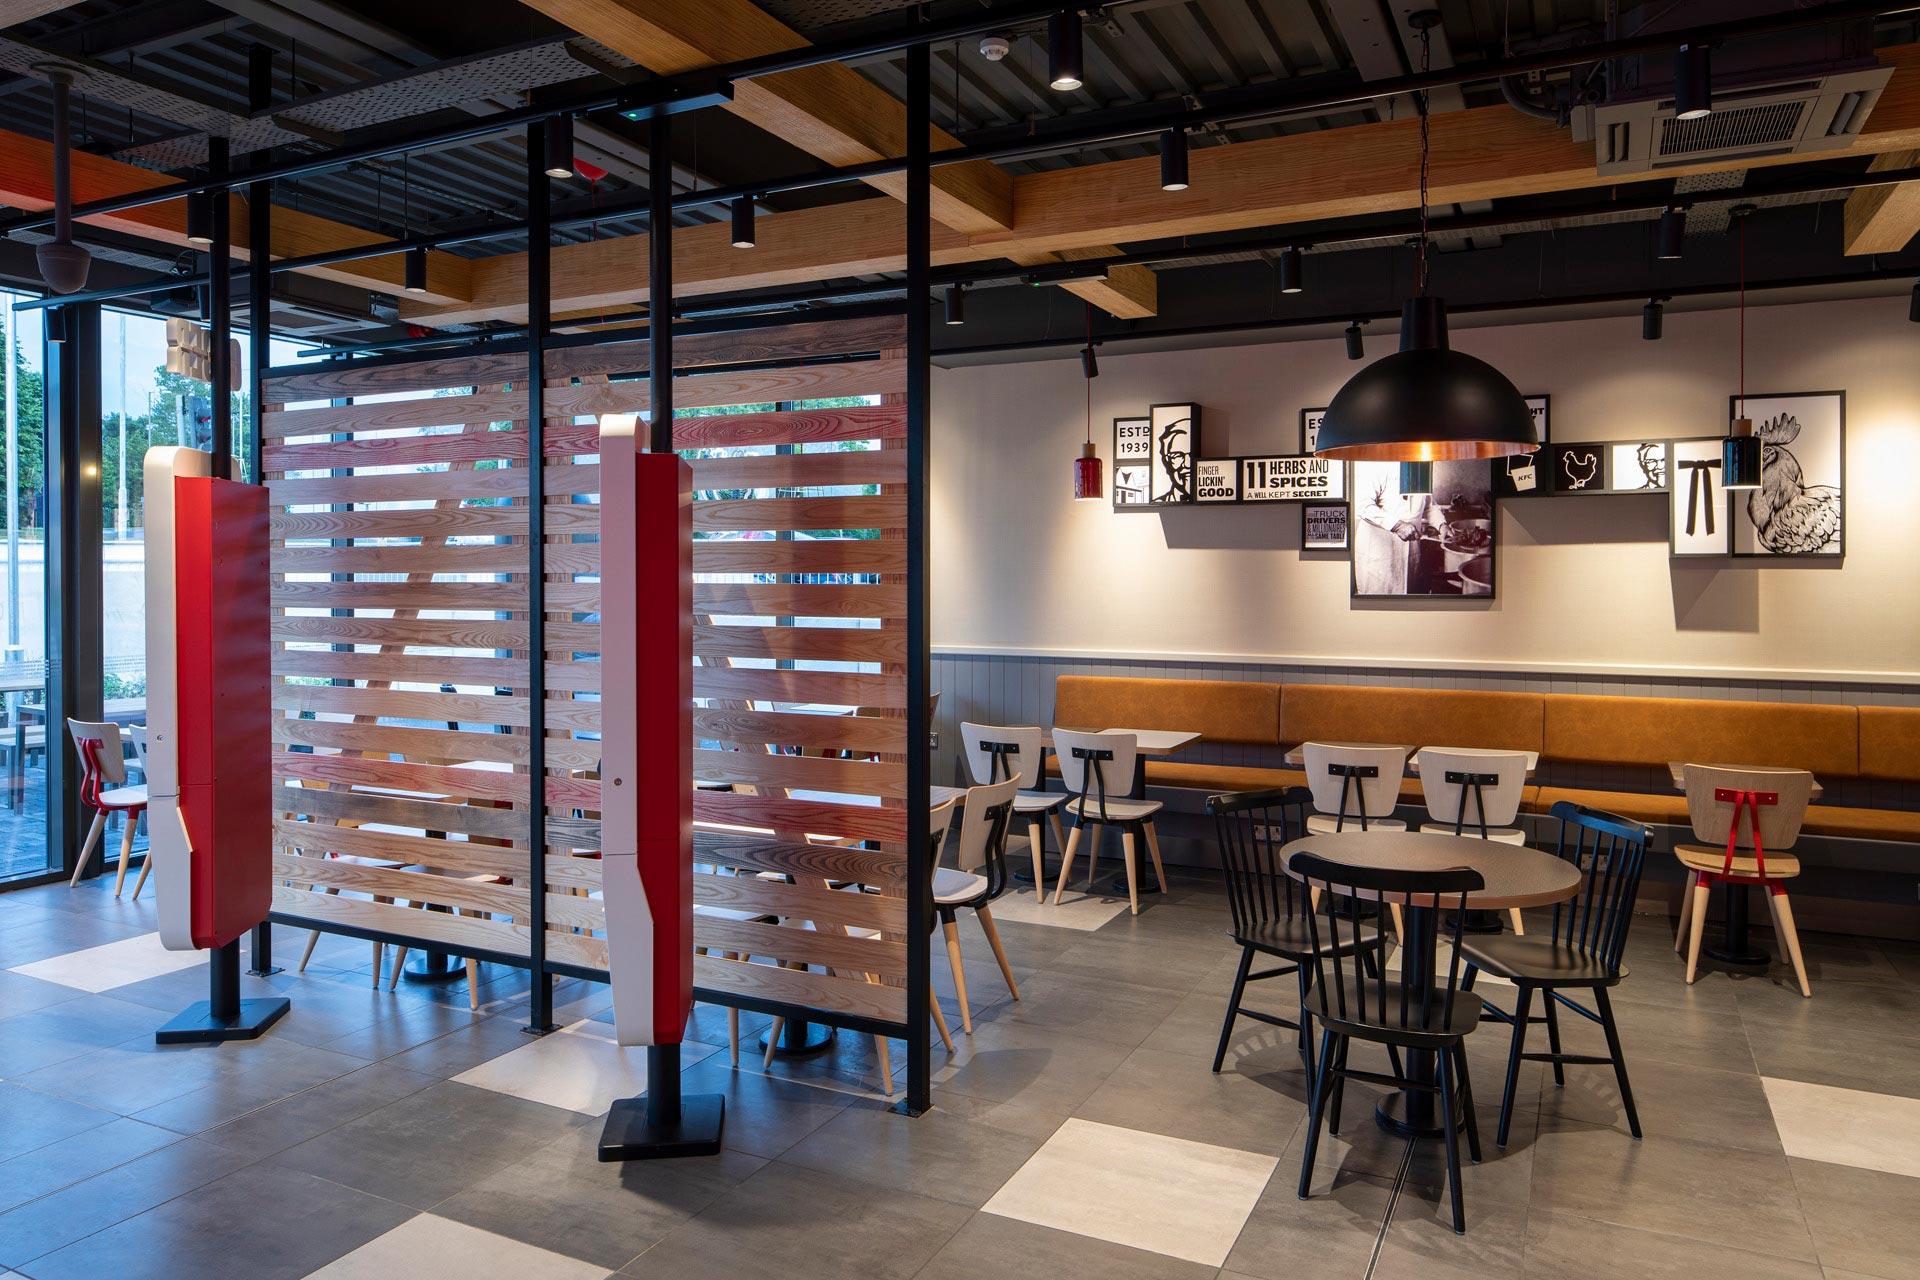 KFC Garston, Liverpool - Modular Restaurant building - Internal dining area